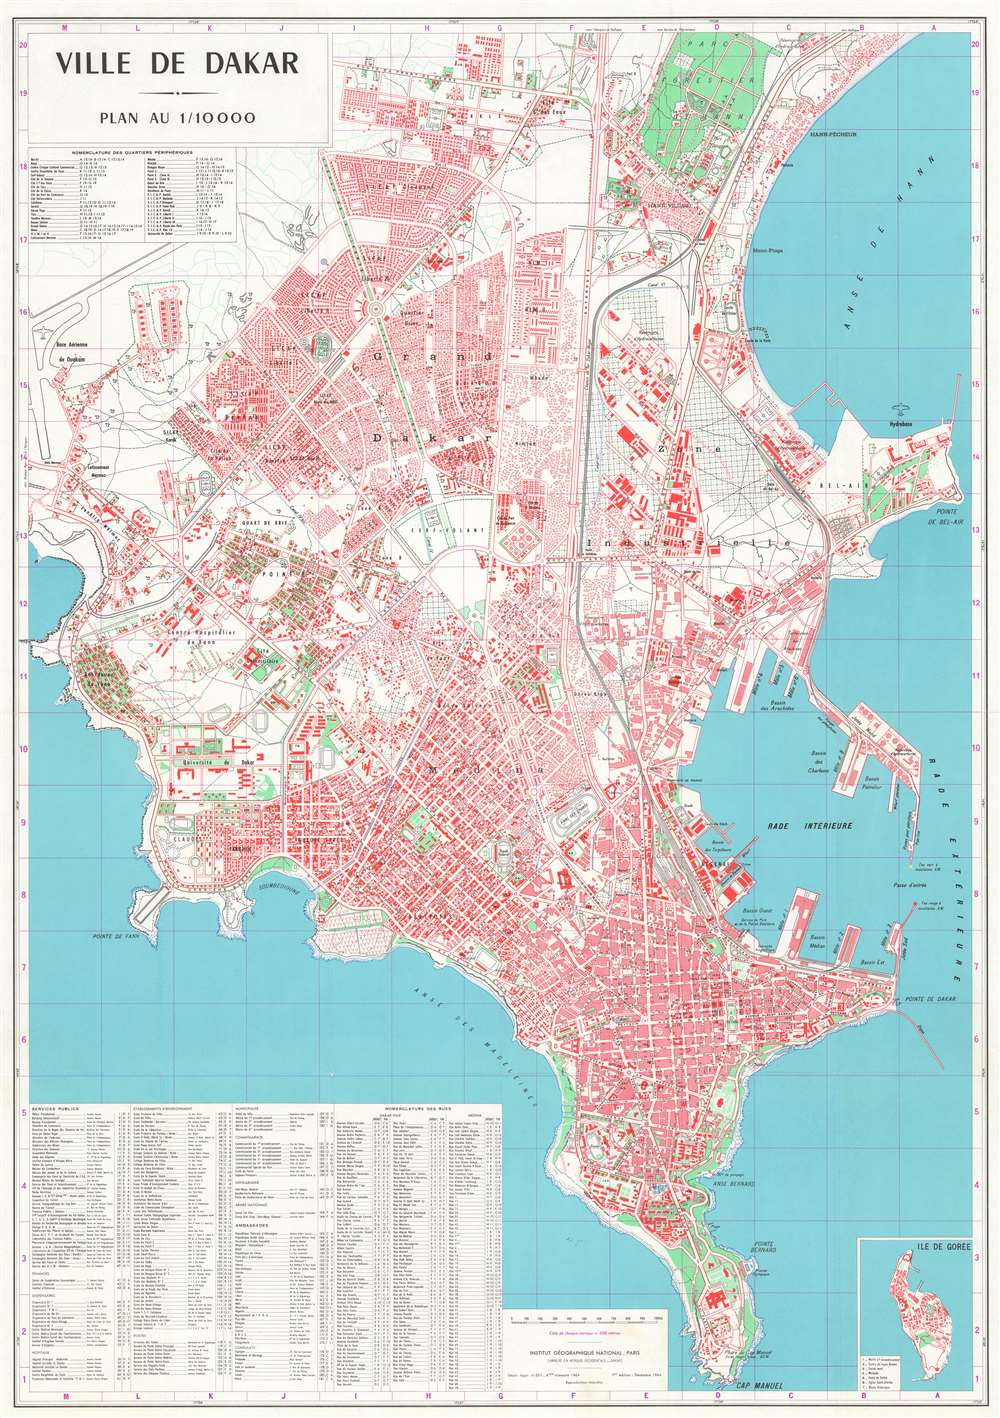 1964 Institut Geographique City Plan or Map of Dakar, Senegal